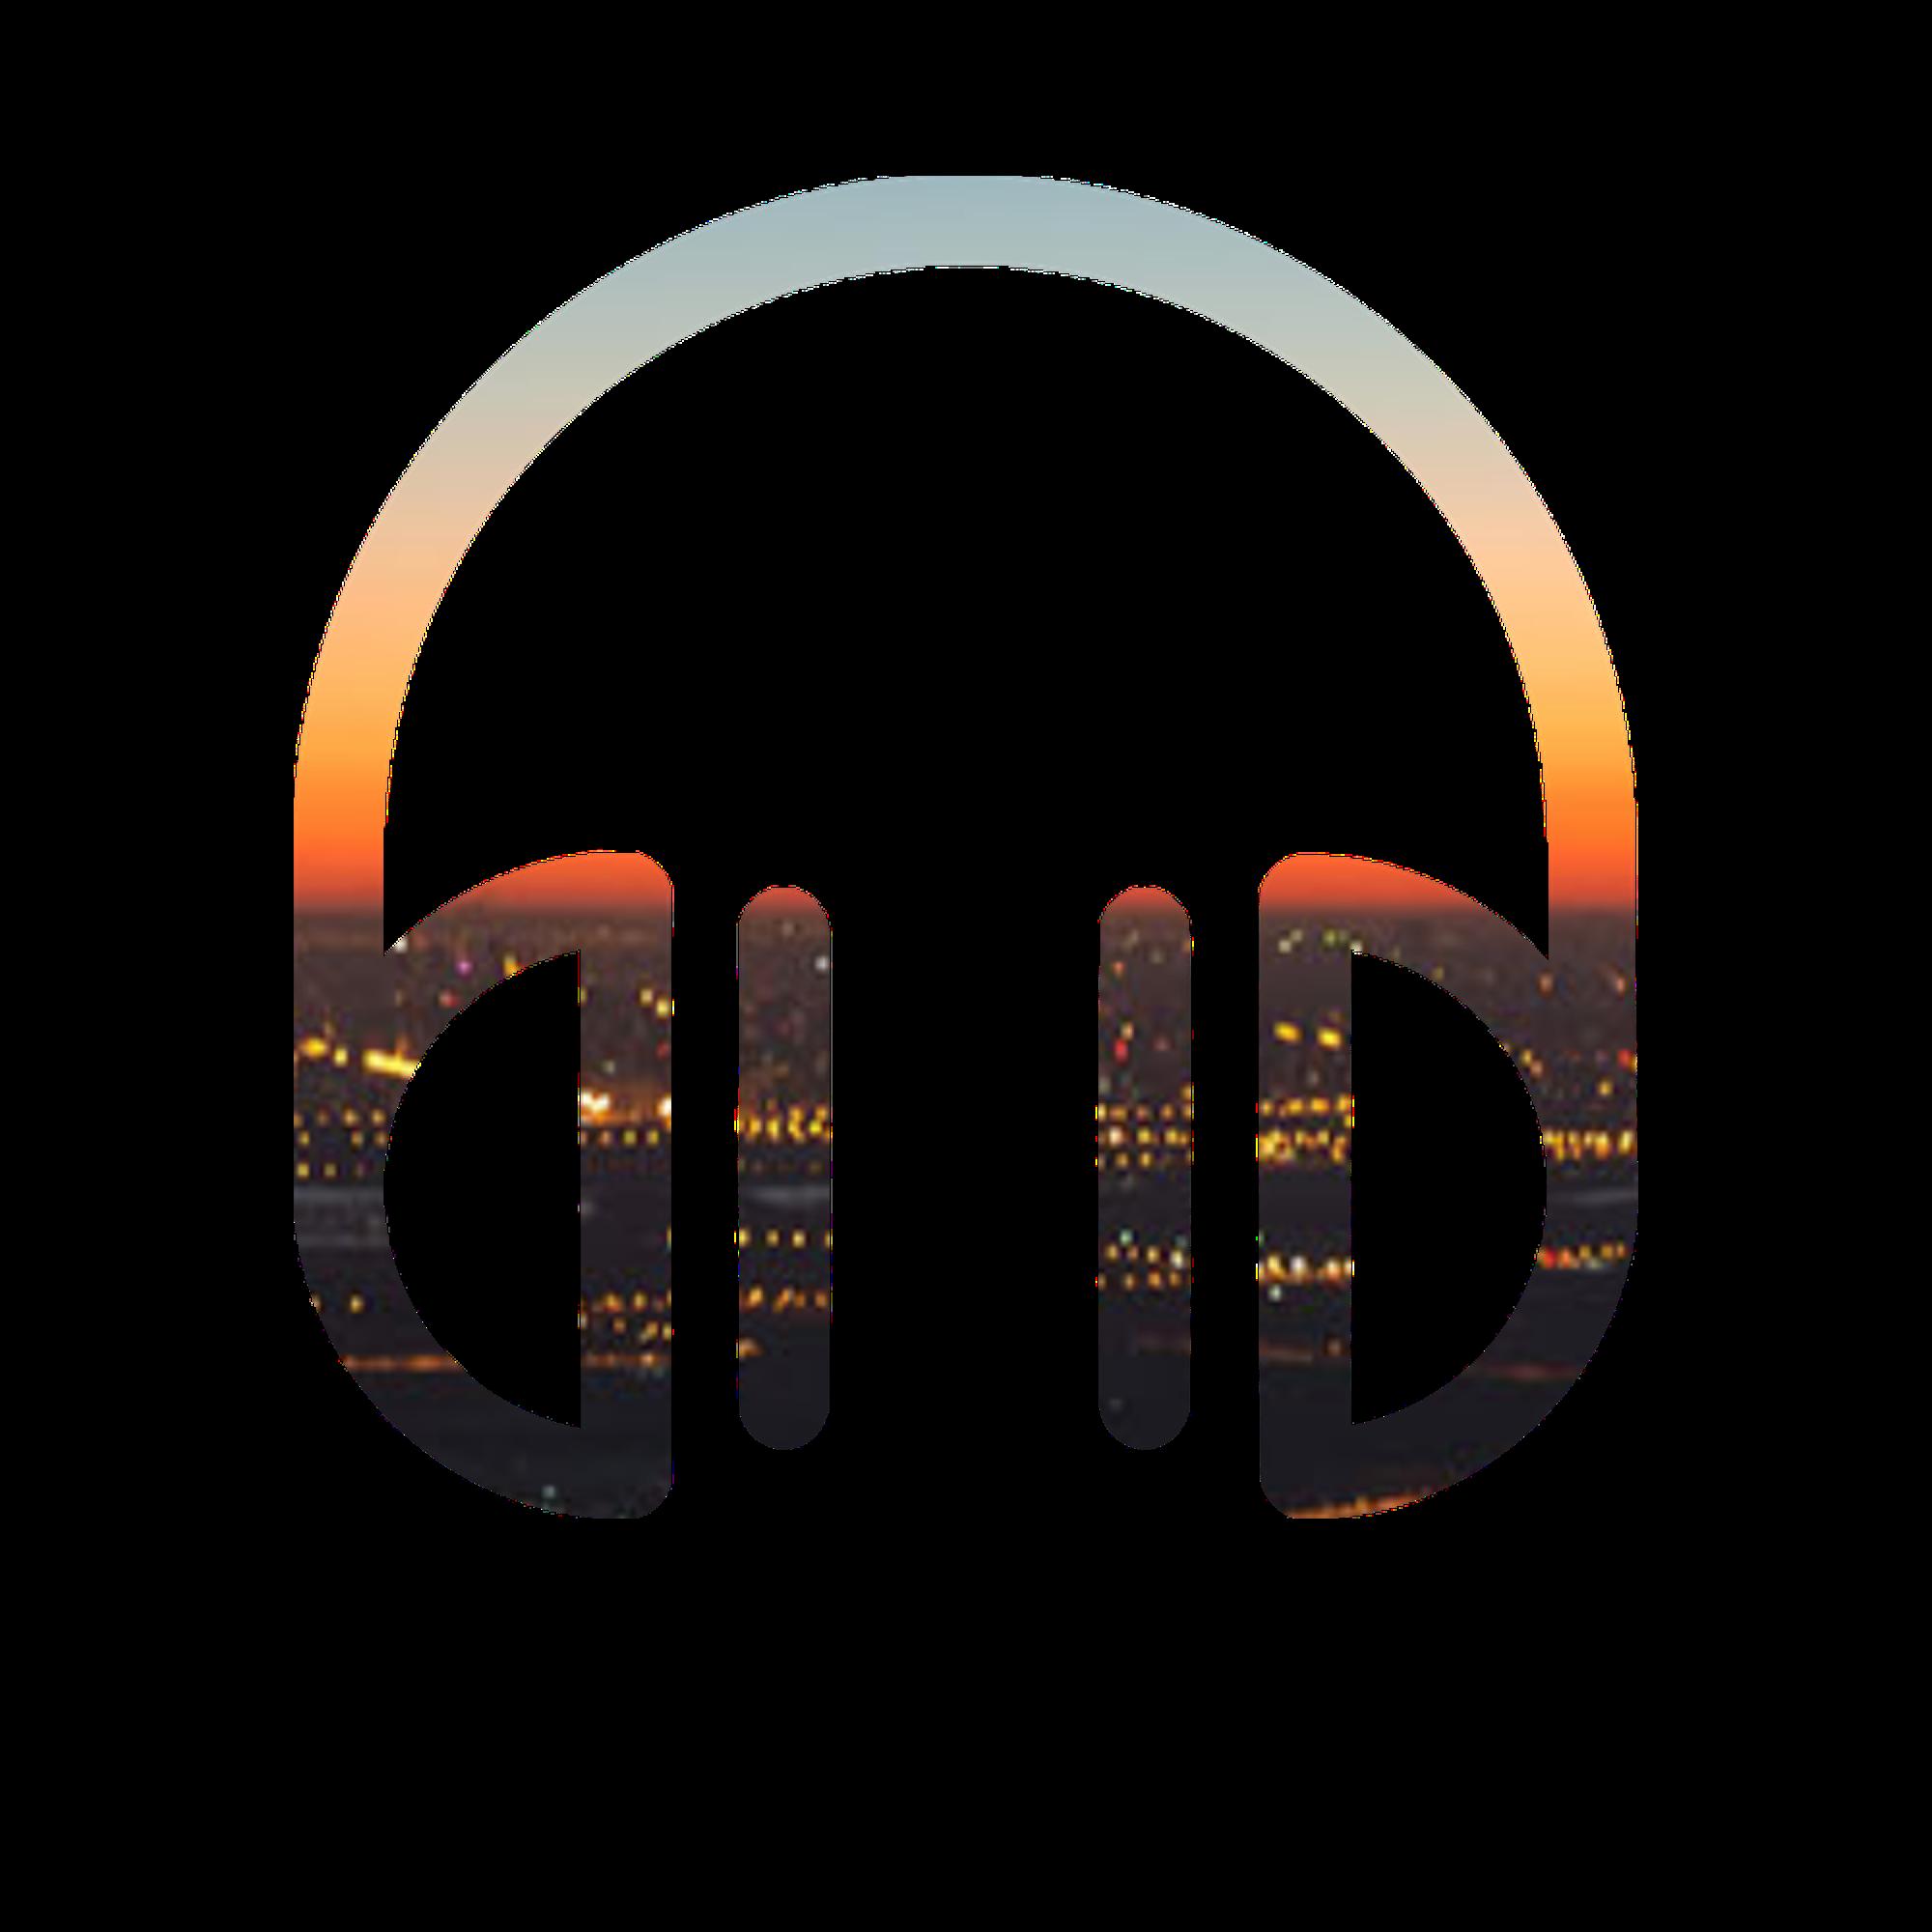 BlockChainJam Podcast - ブロックチェーンジャム ポッドキャスト show art